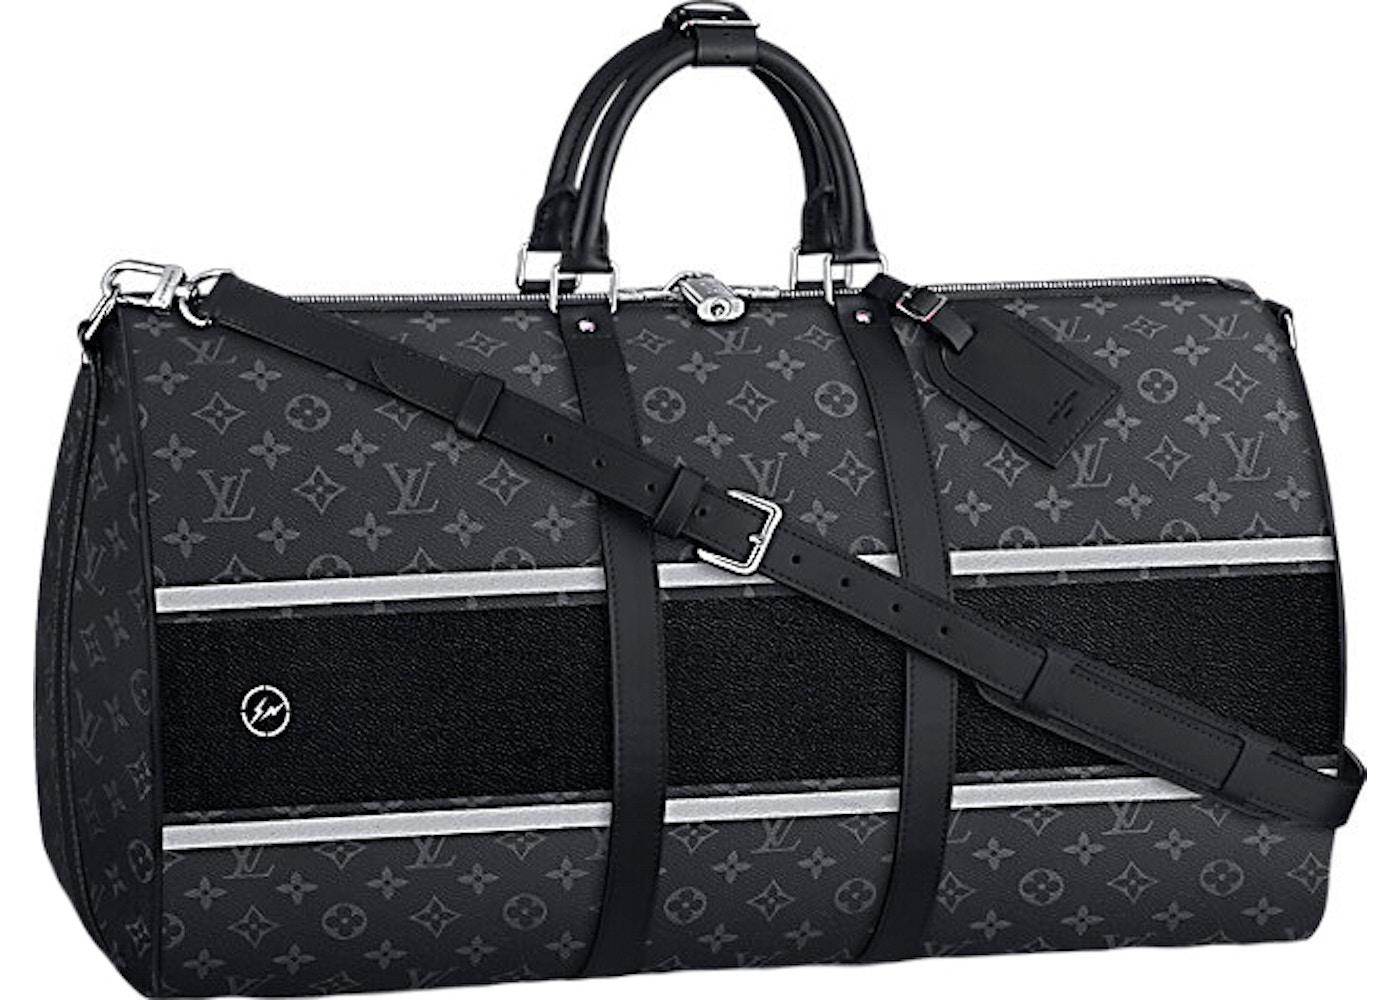 239728f58569 Louis Vuitton x fragment Keepall Bandouliere Monogram Eclipse 55 Black. Monogram  Eclipse 55 Black